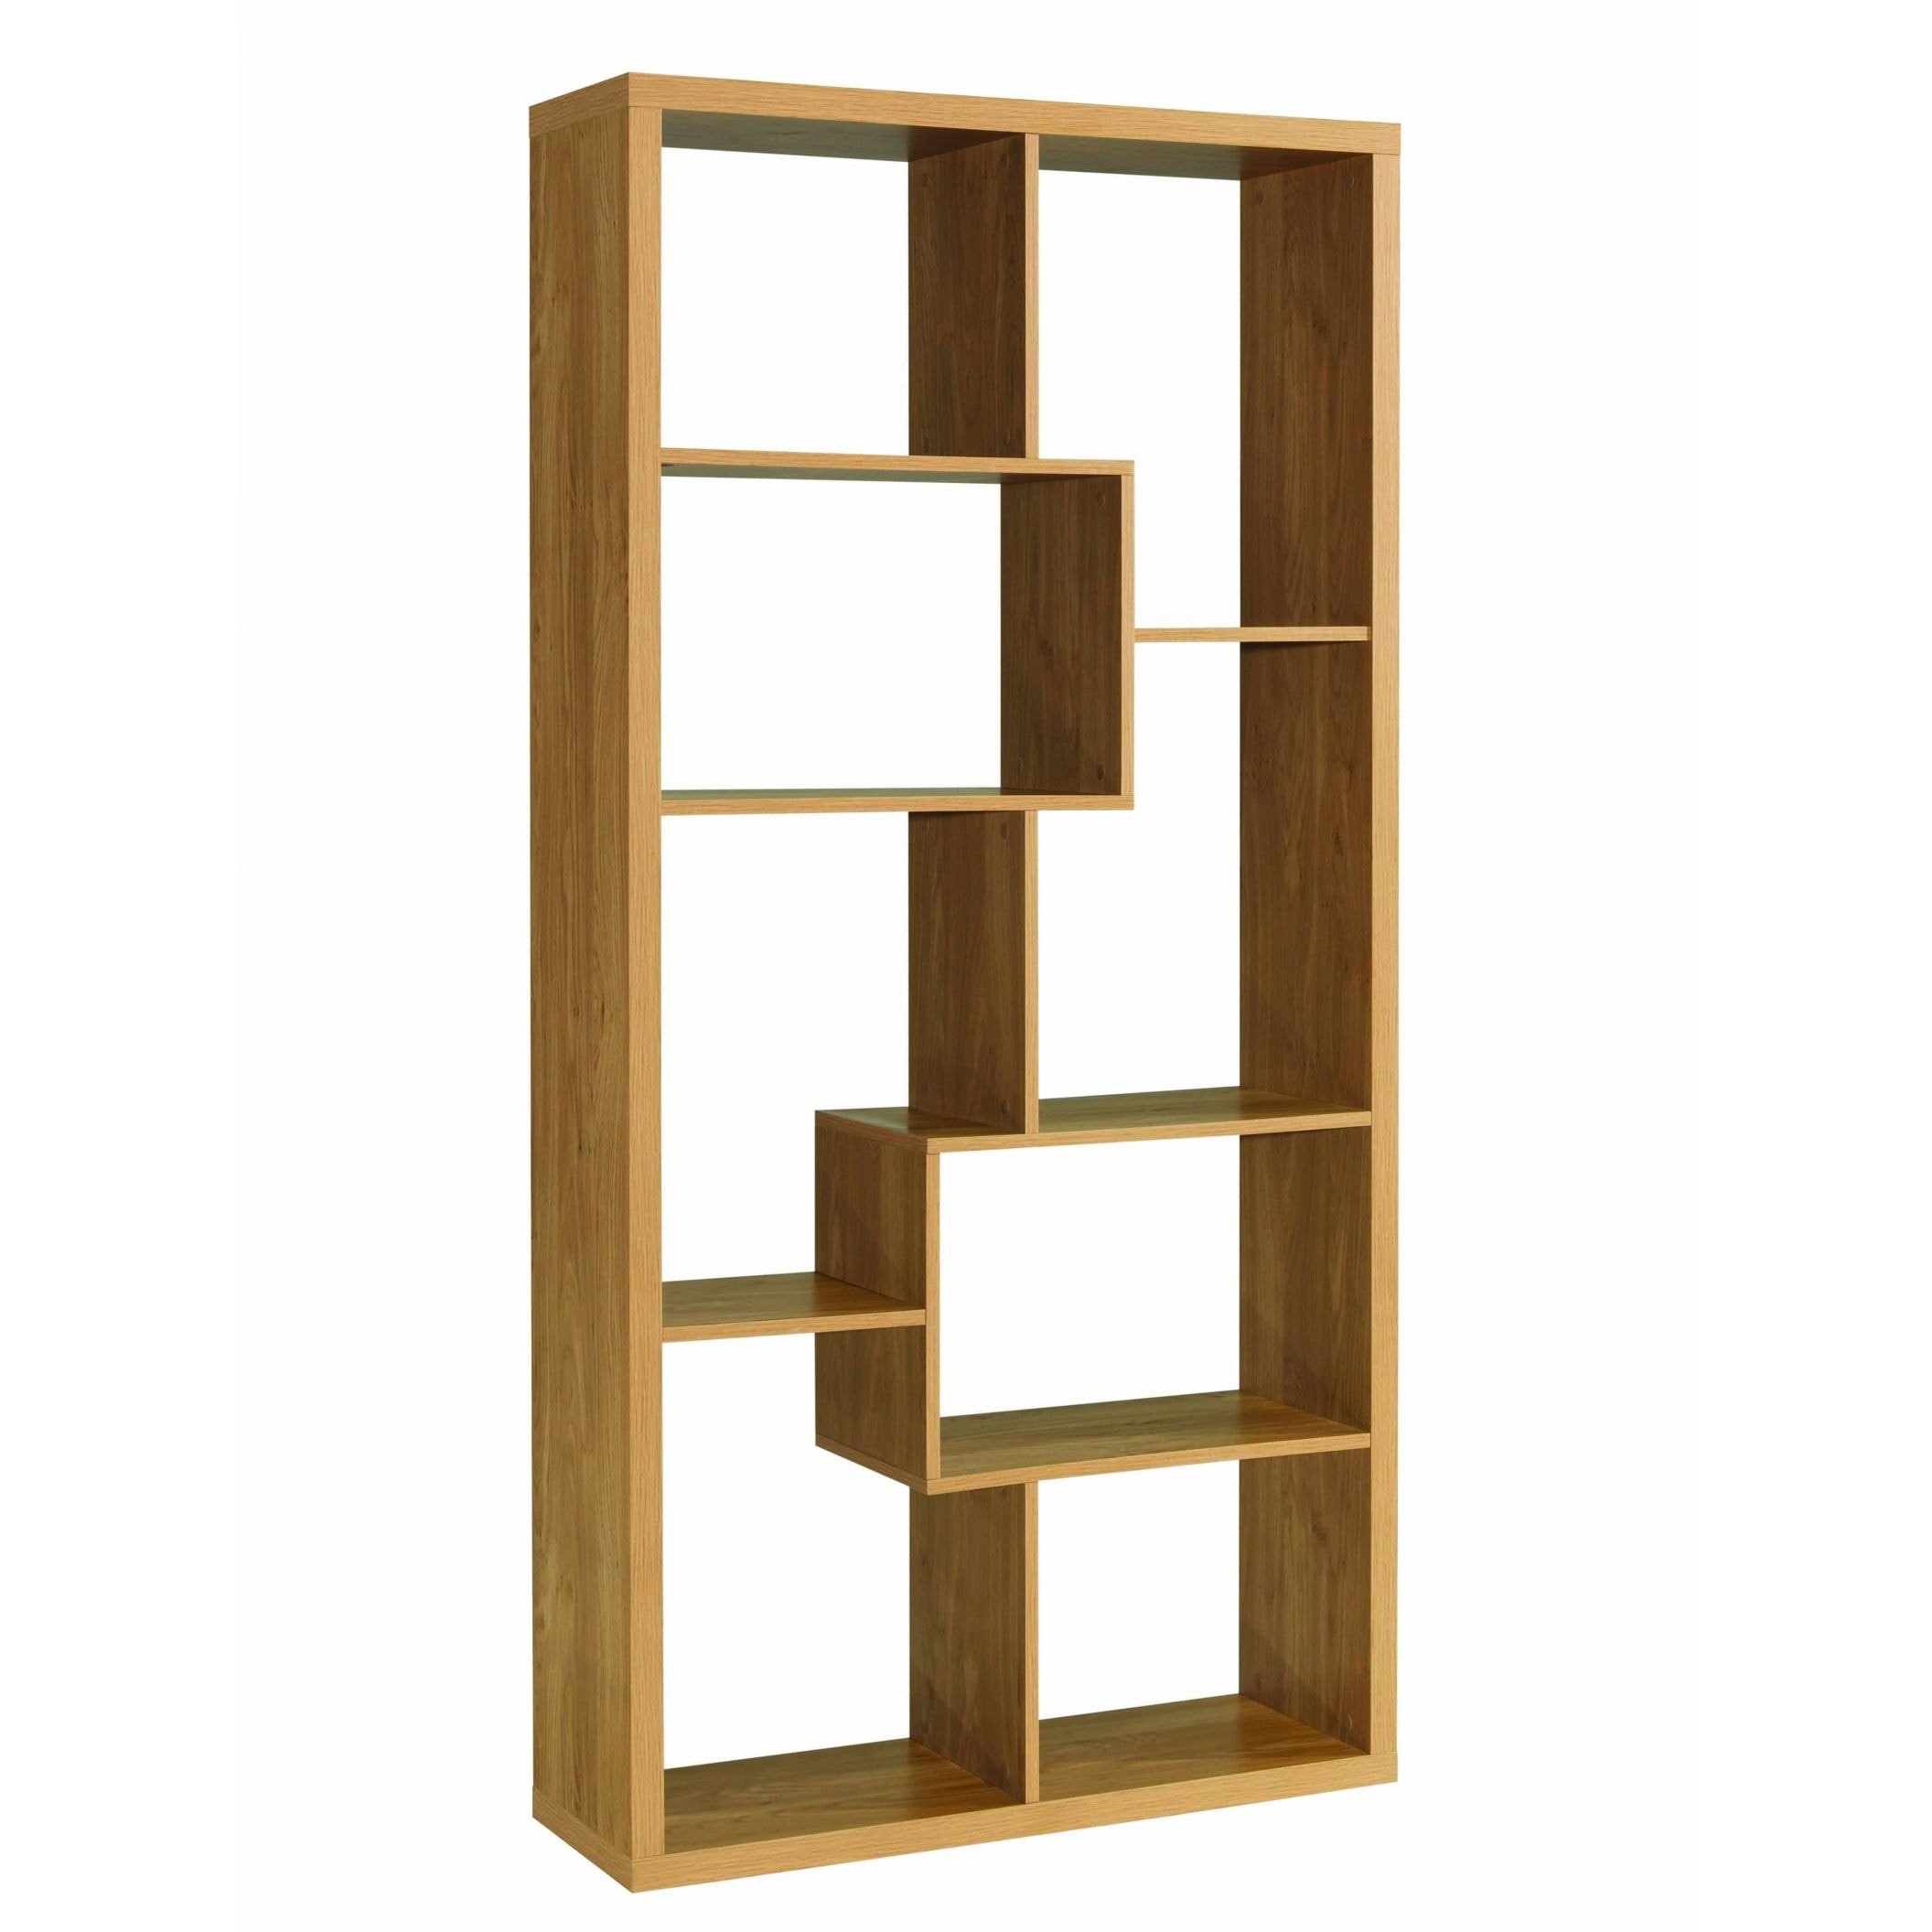 Quebec display unit modern furniture collection online